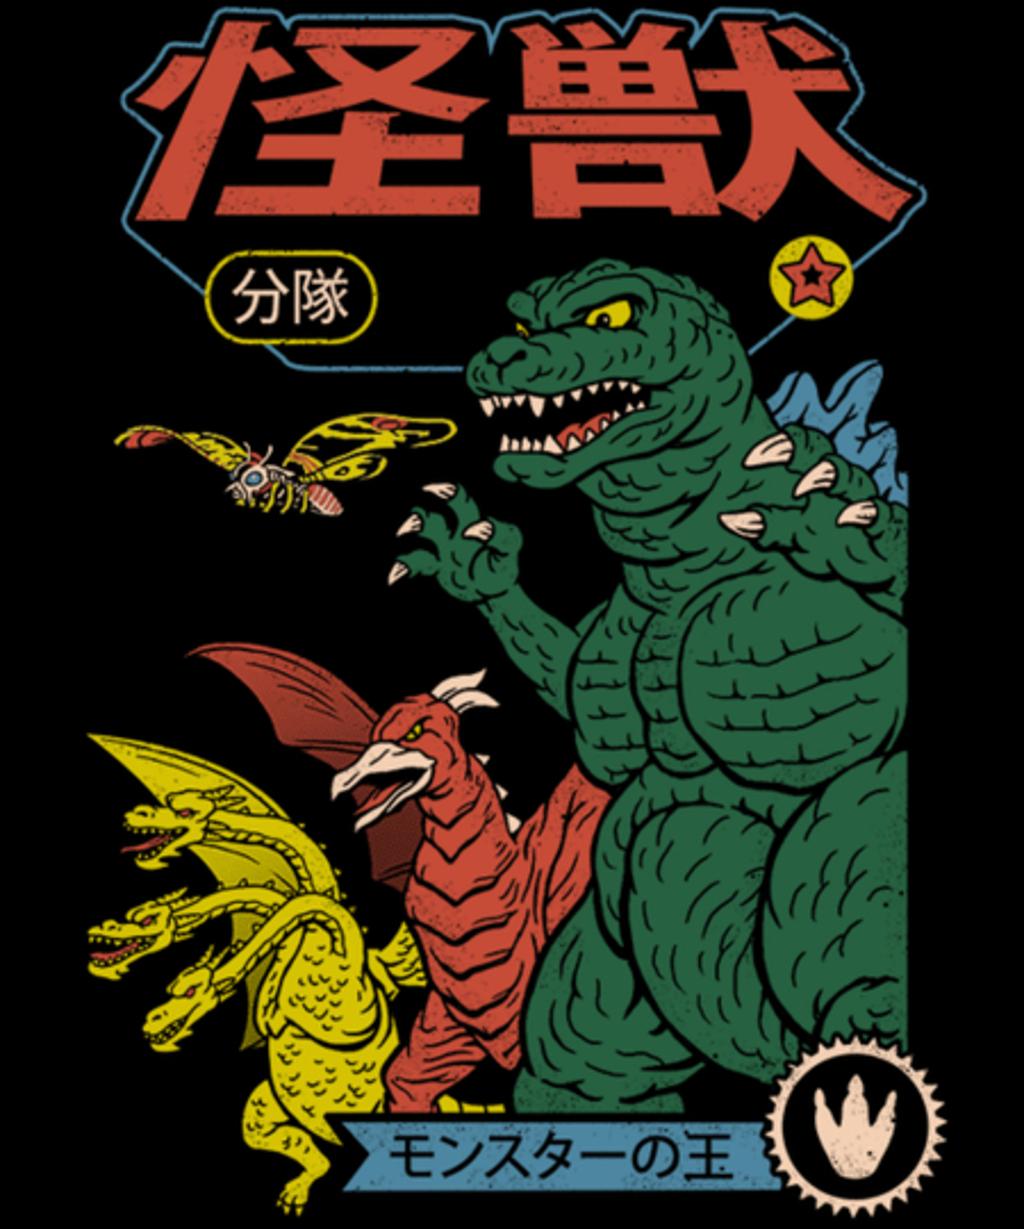 Qwertee: Kaiju Sentai